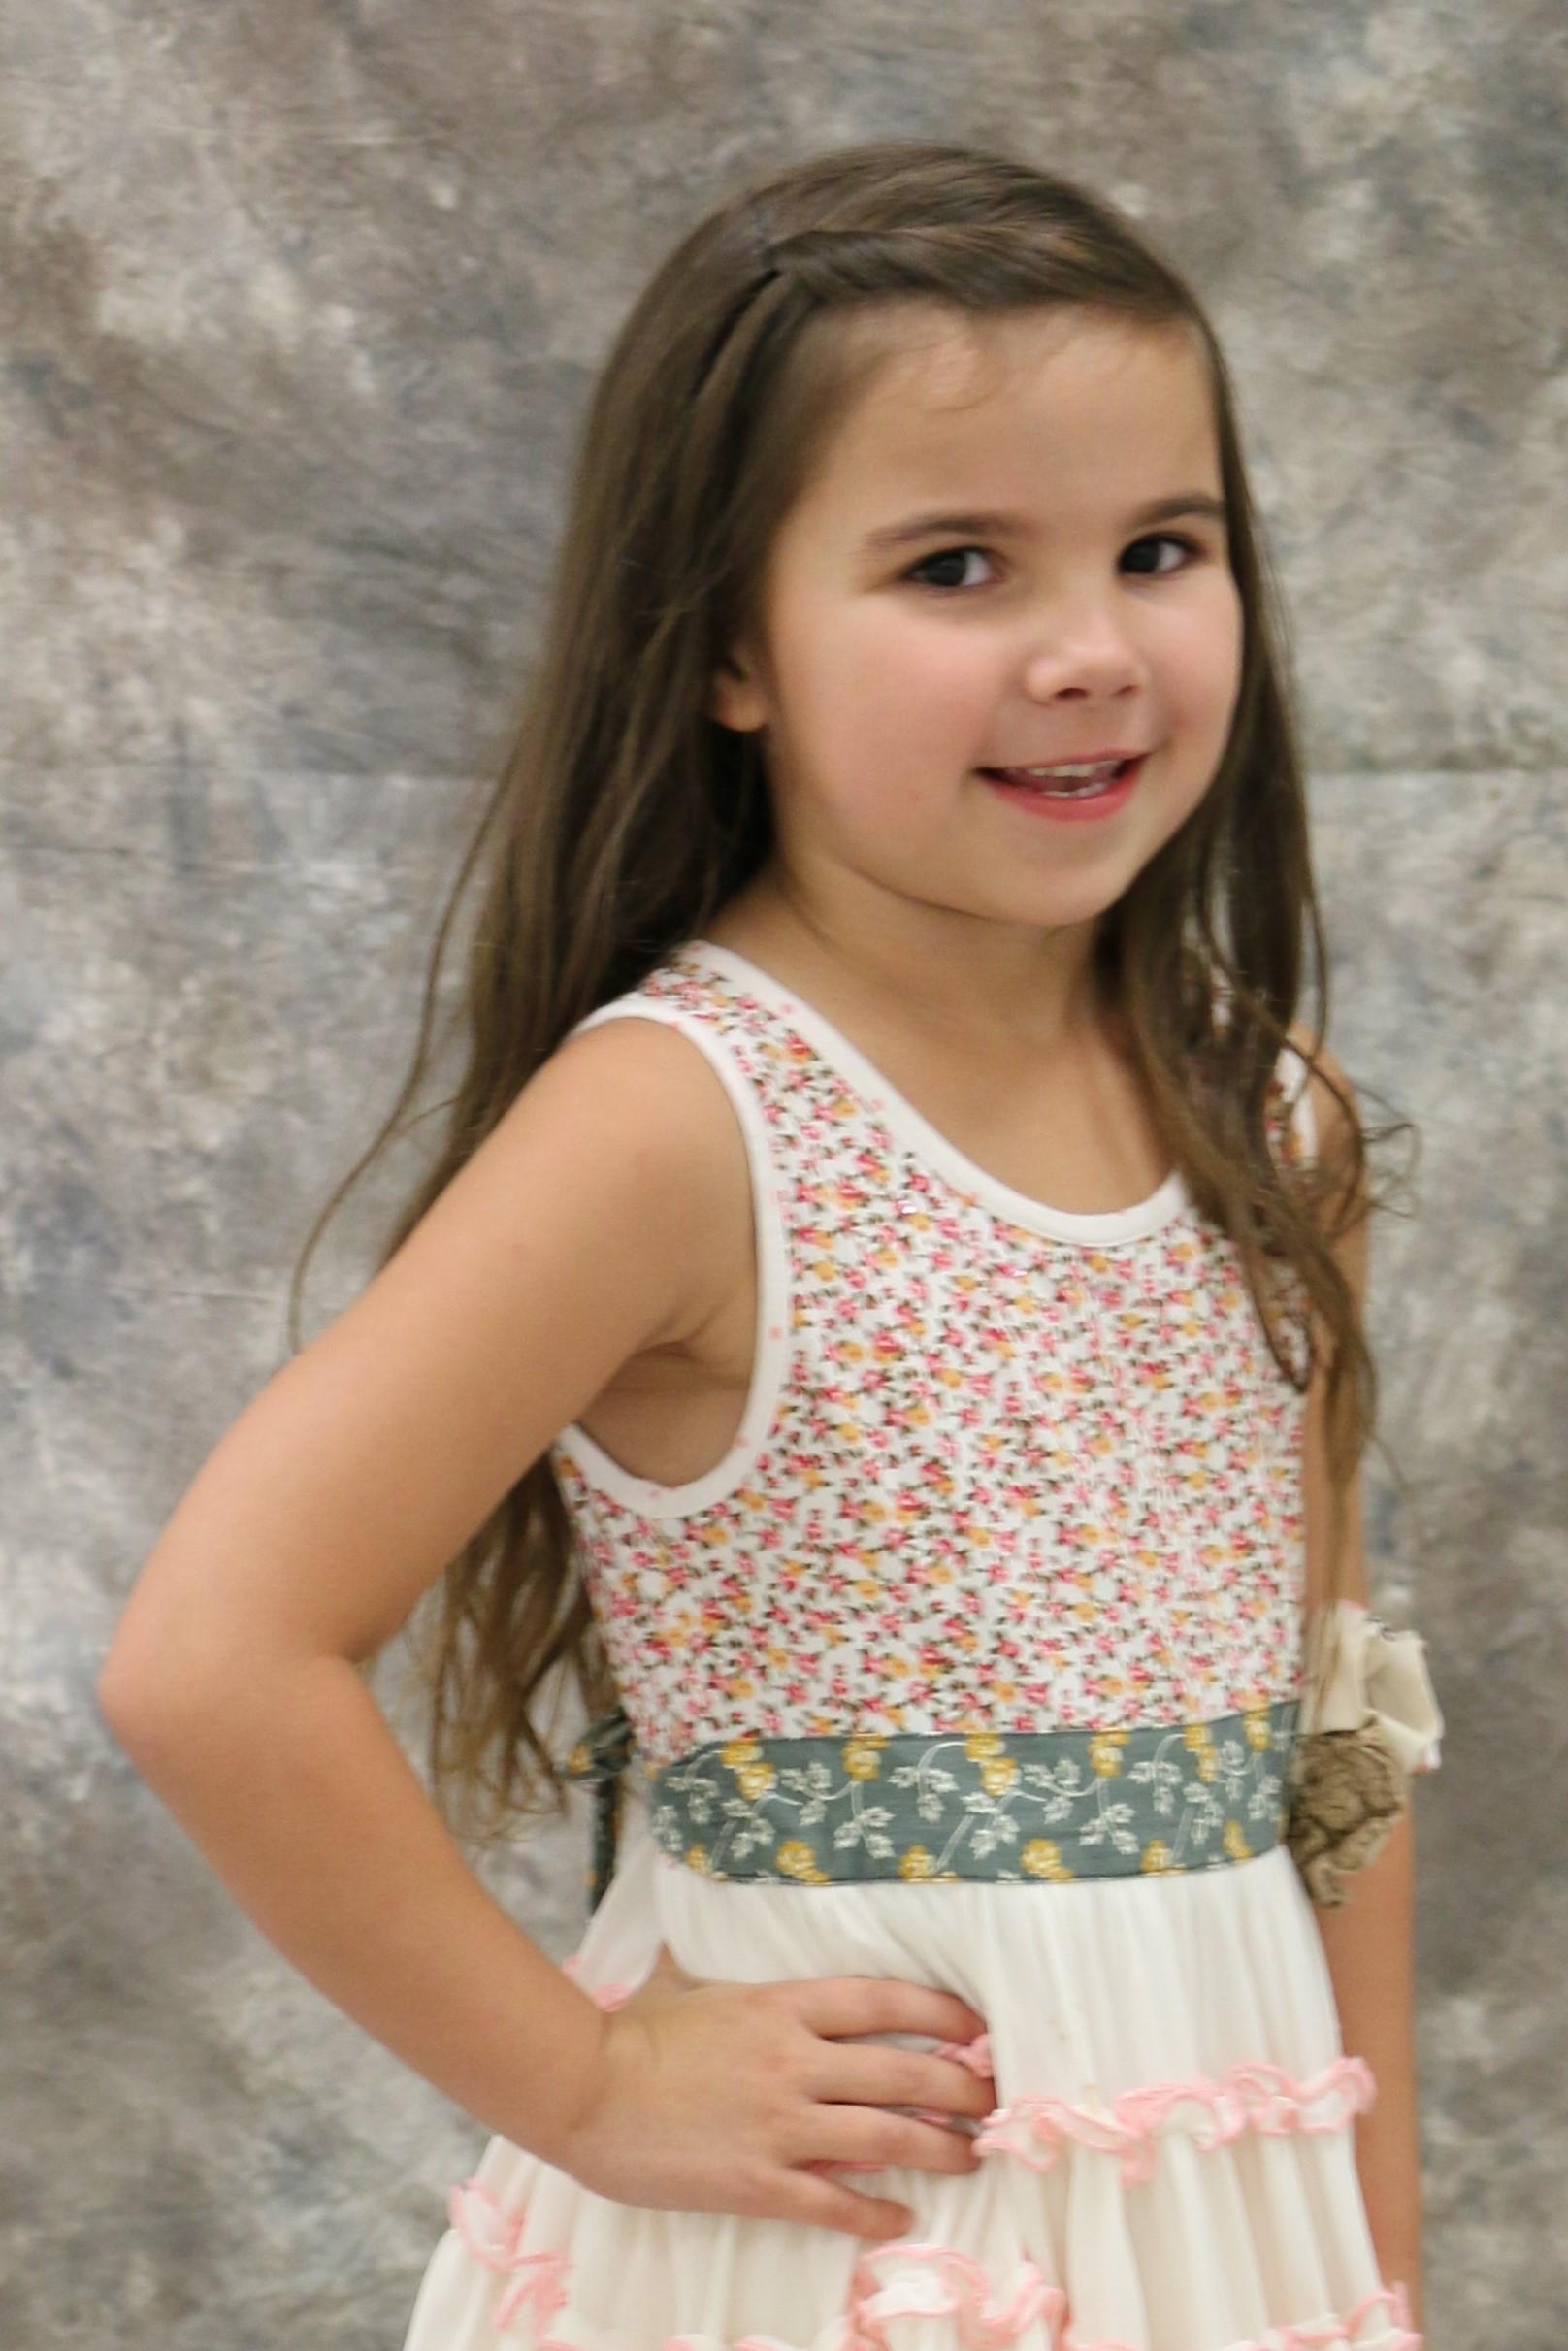 Little Miss Contestant - Everley DeMotte 5